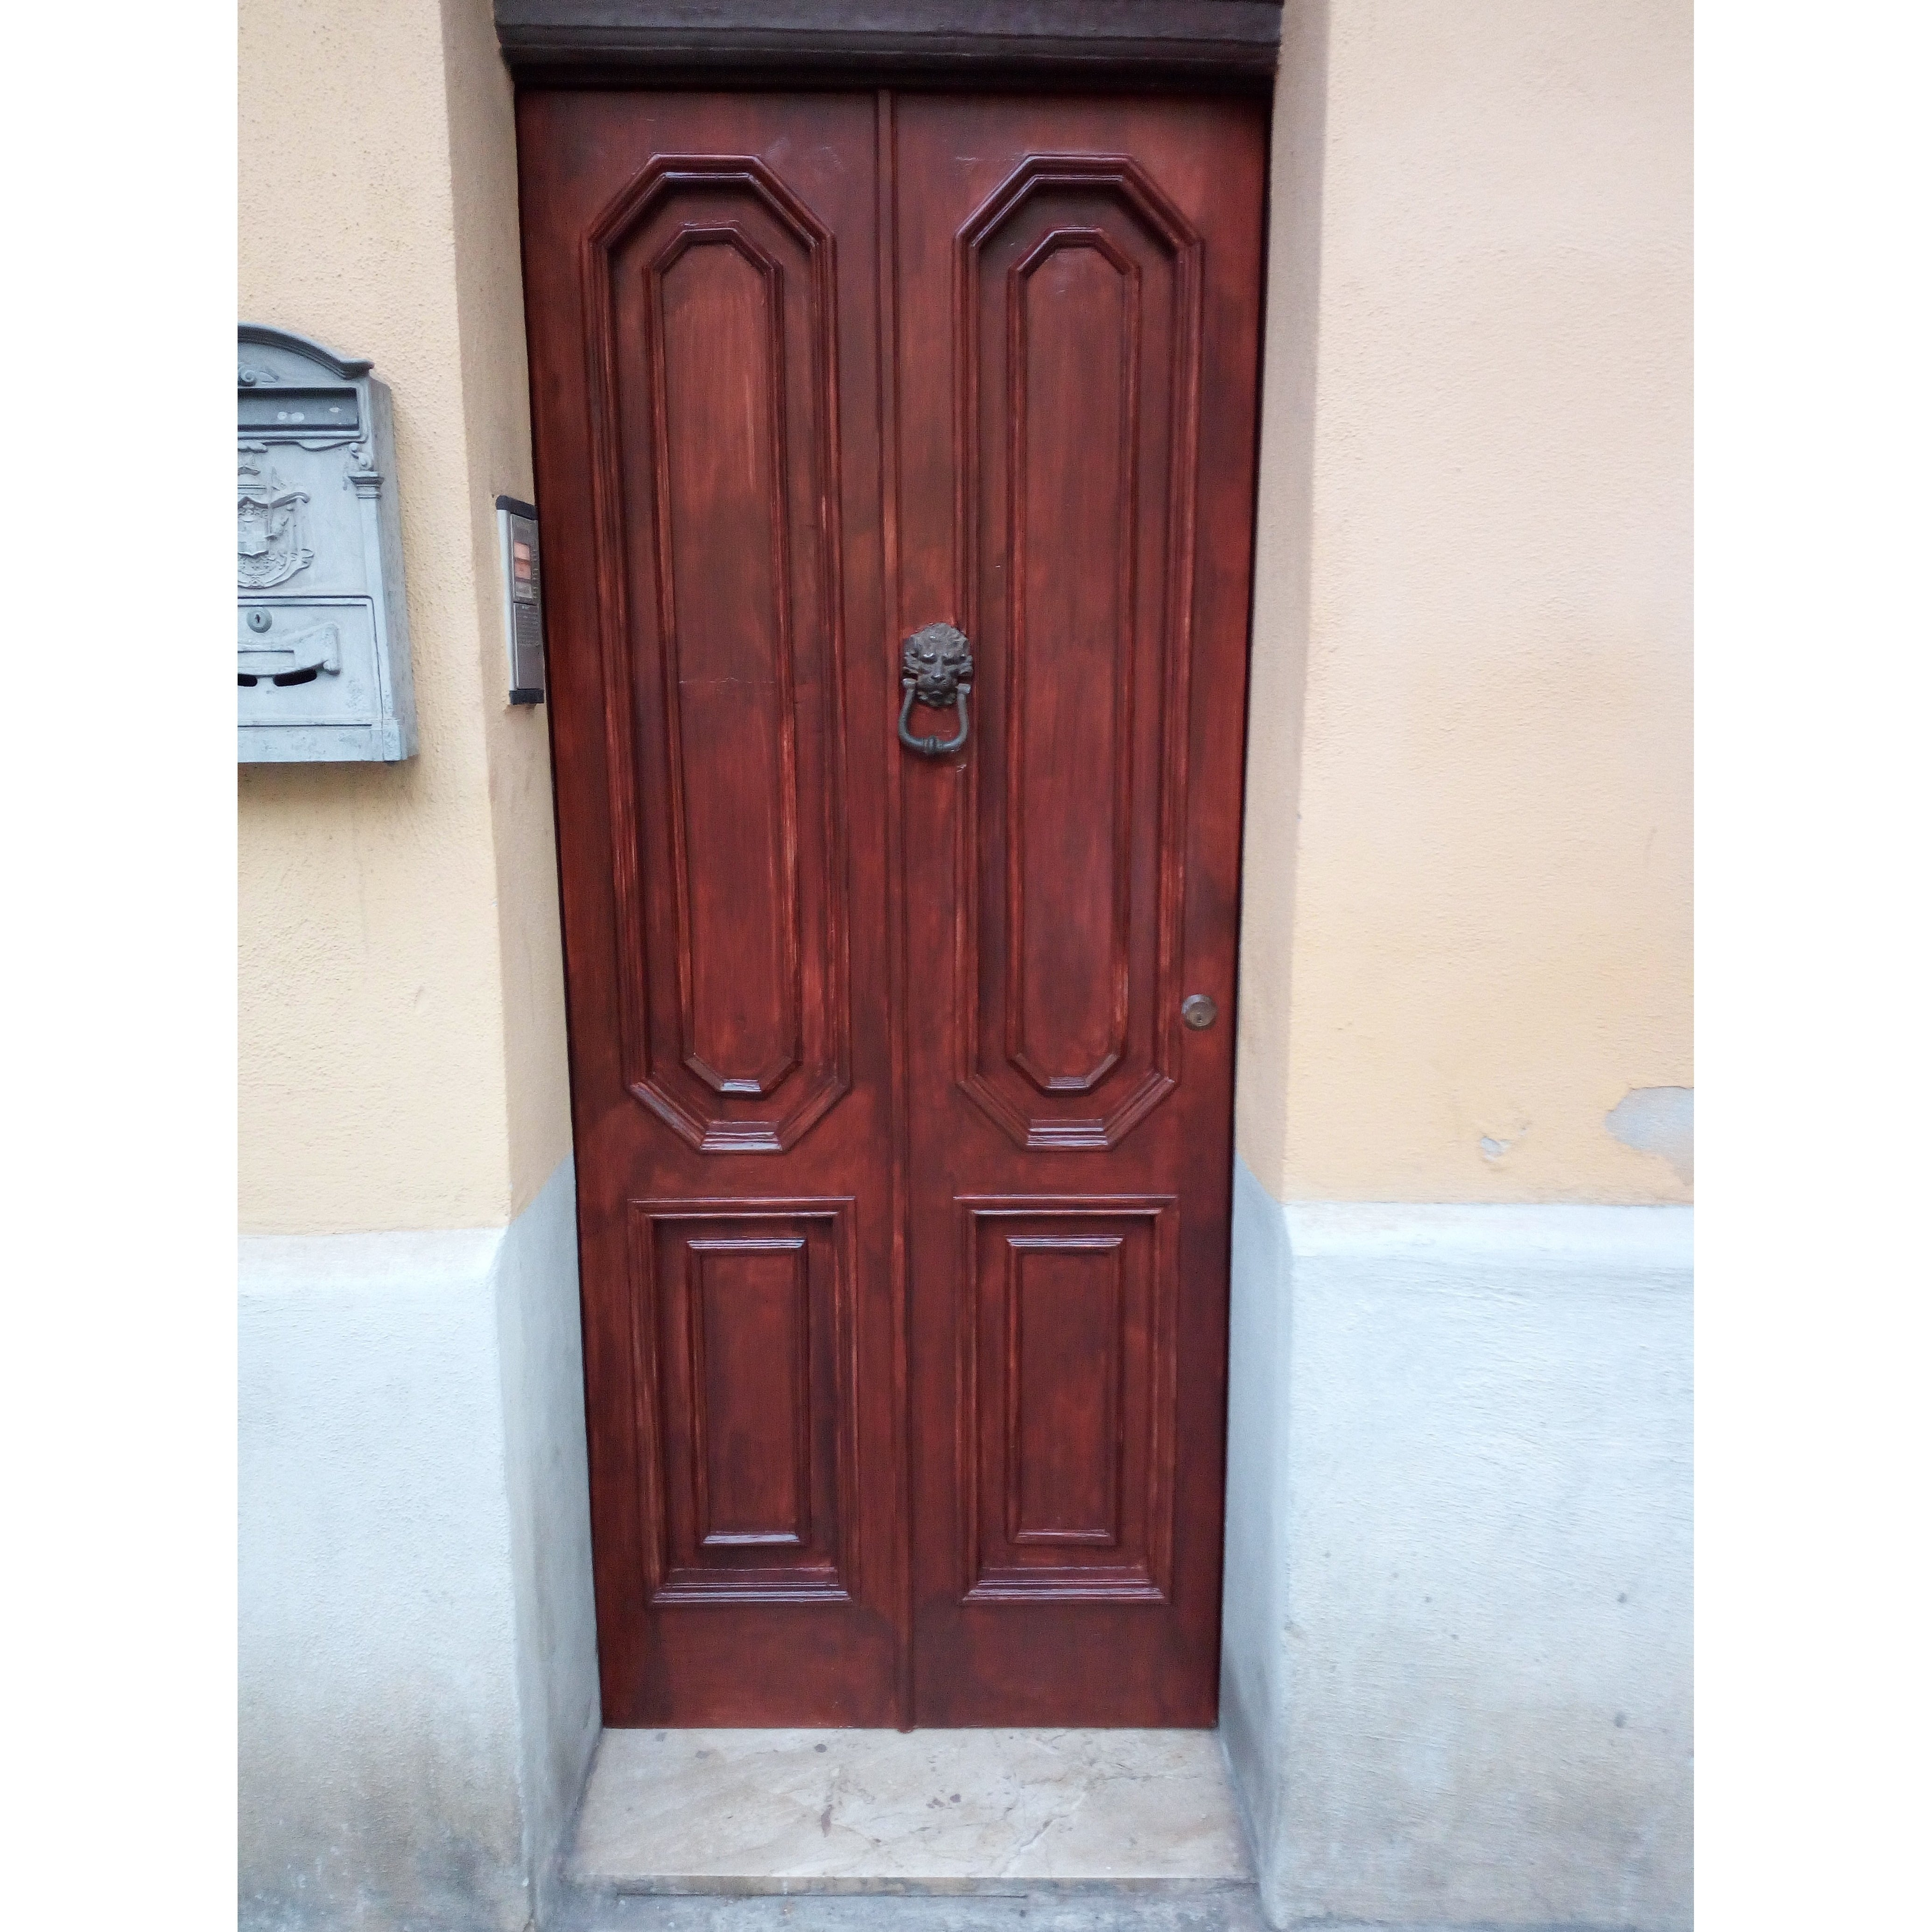 Scale Prefabbricate Per Esterni Sardegna i migliori 20 costruttori di case prefabbricate in legno a